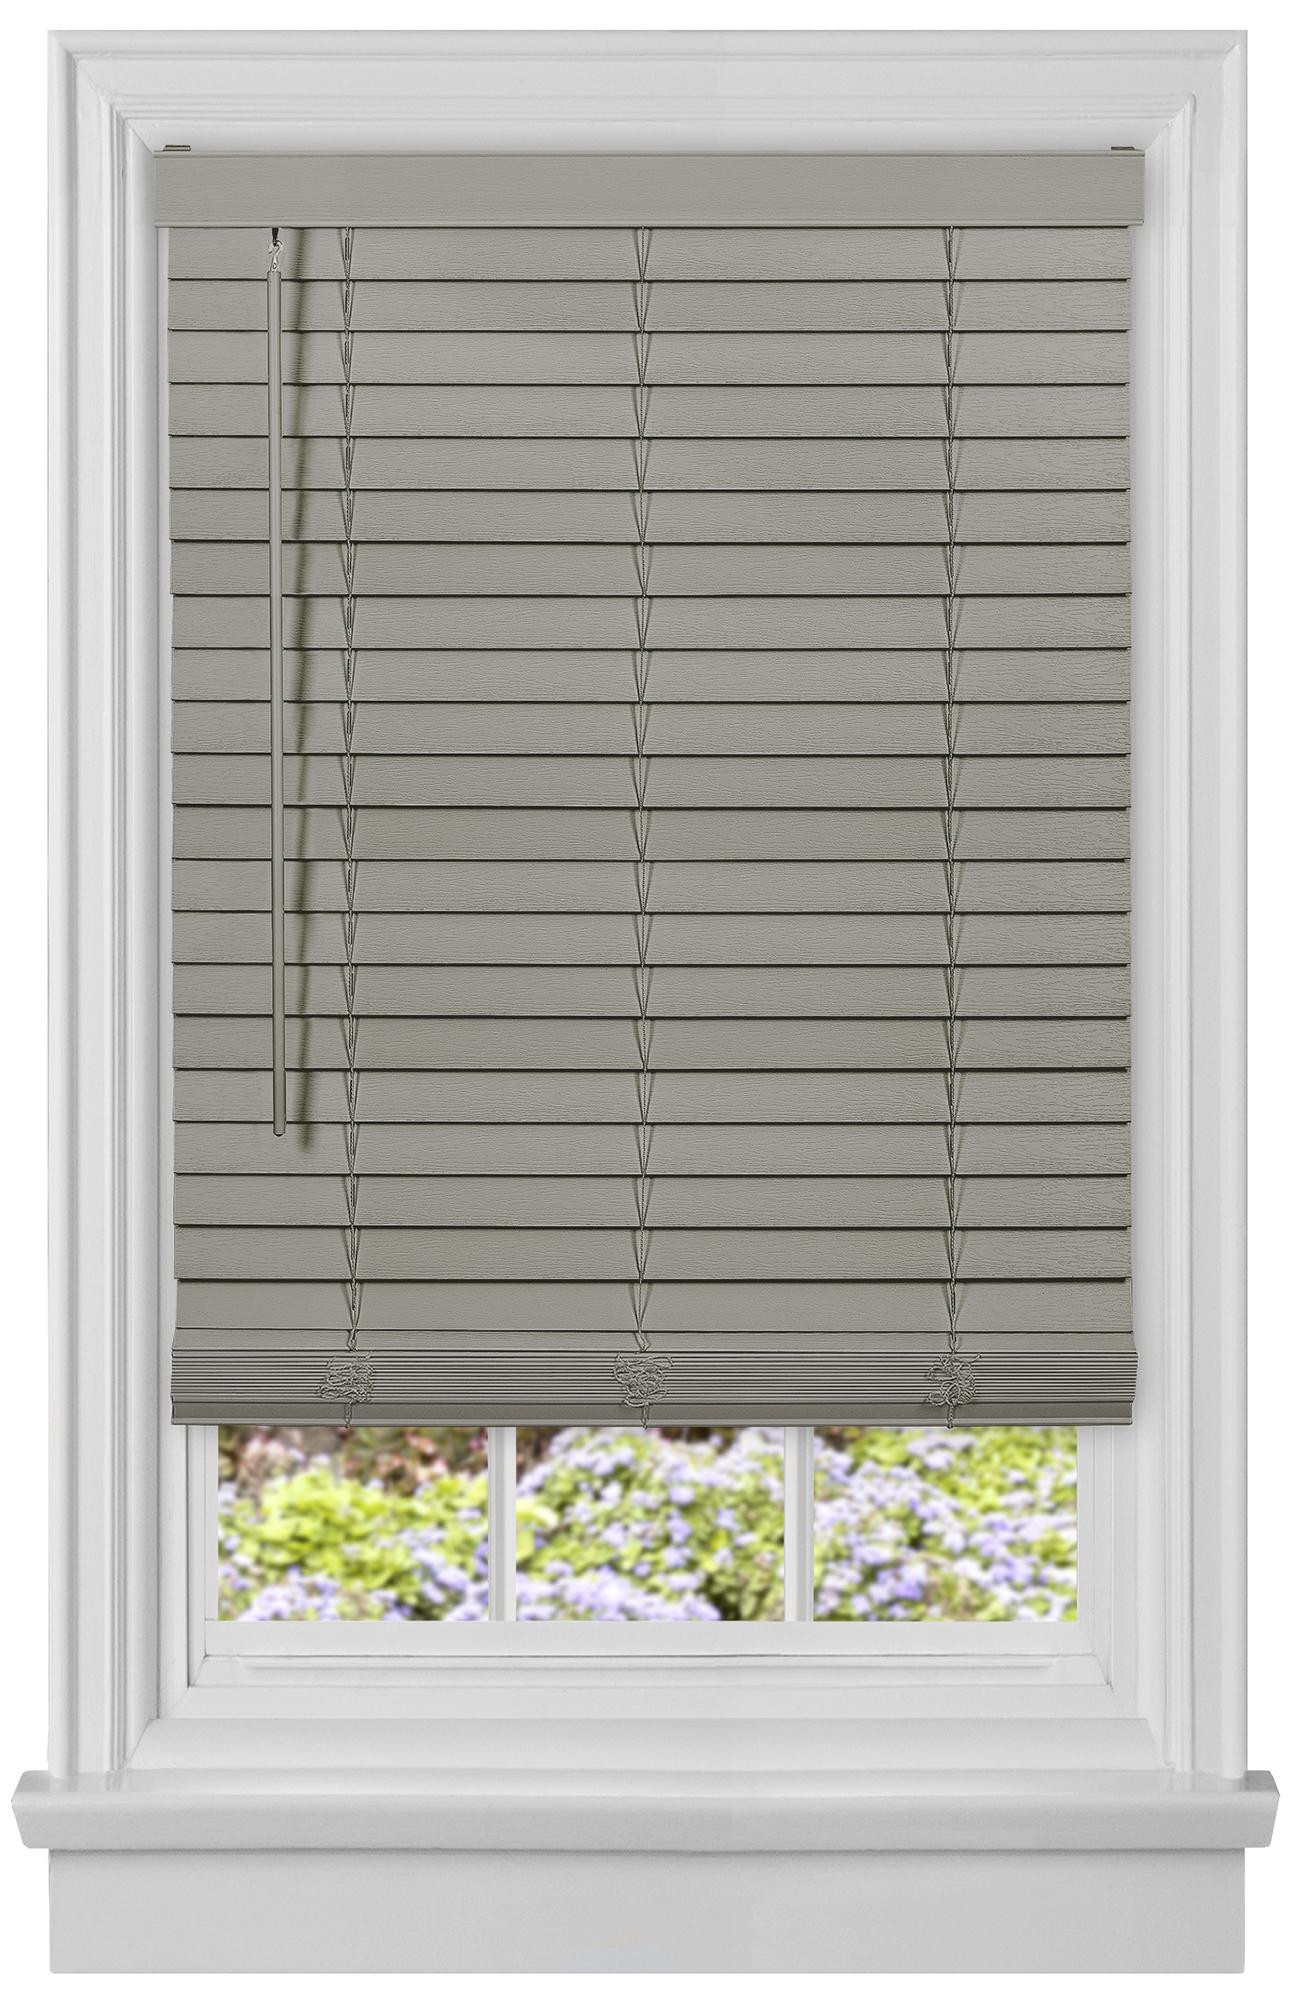 Cordless 2 Inch Faux Wood Blinds.Details About Cordless Gray Mini Window Blinds 2 Inch Faux Wood Grain Plantation Blind